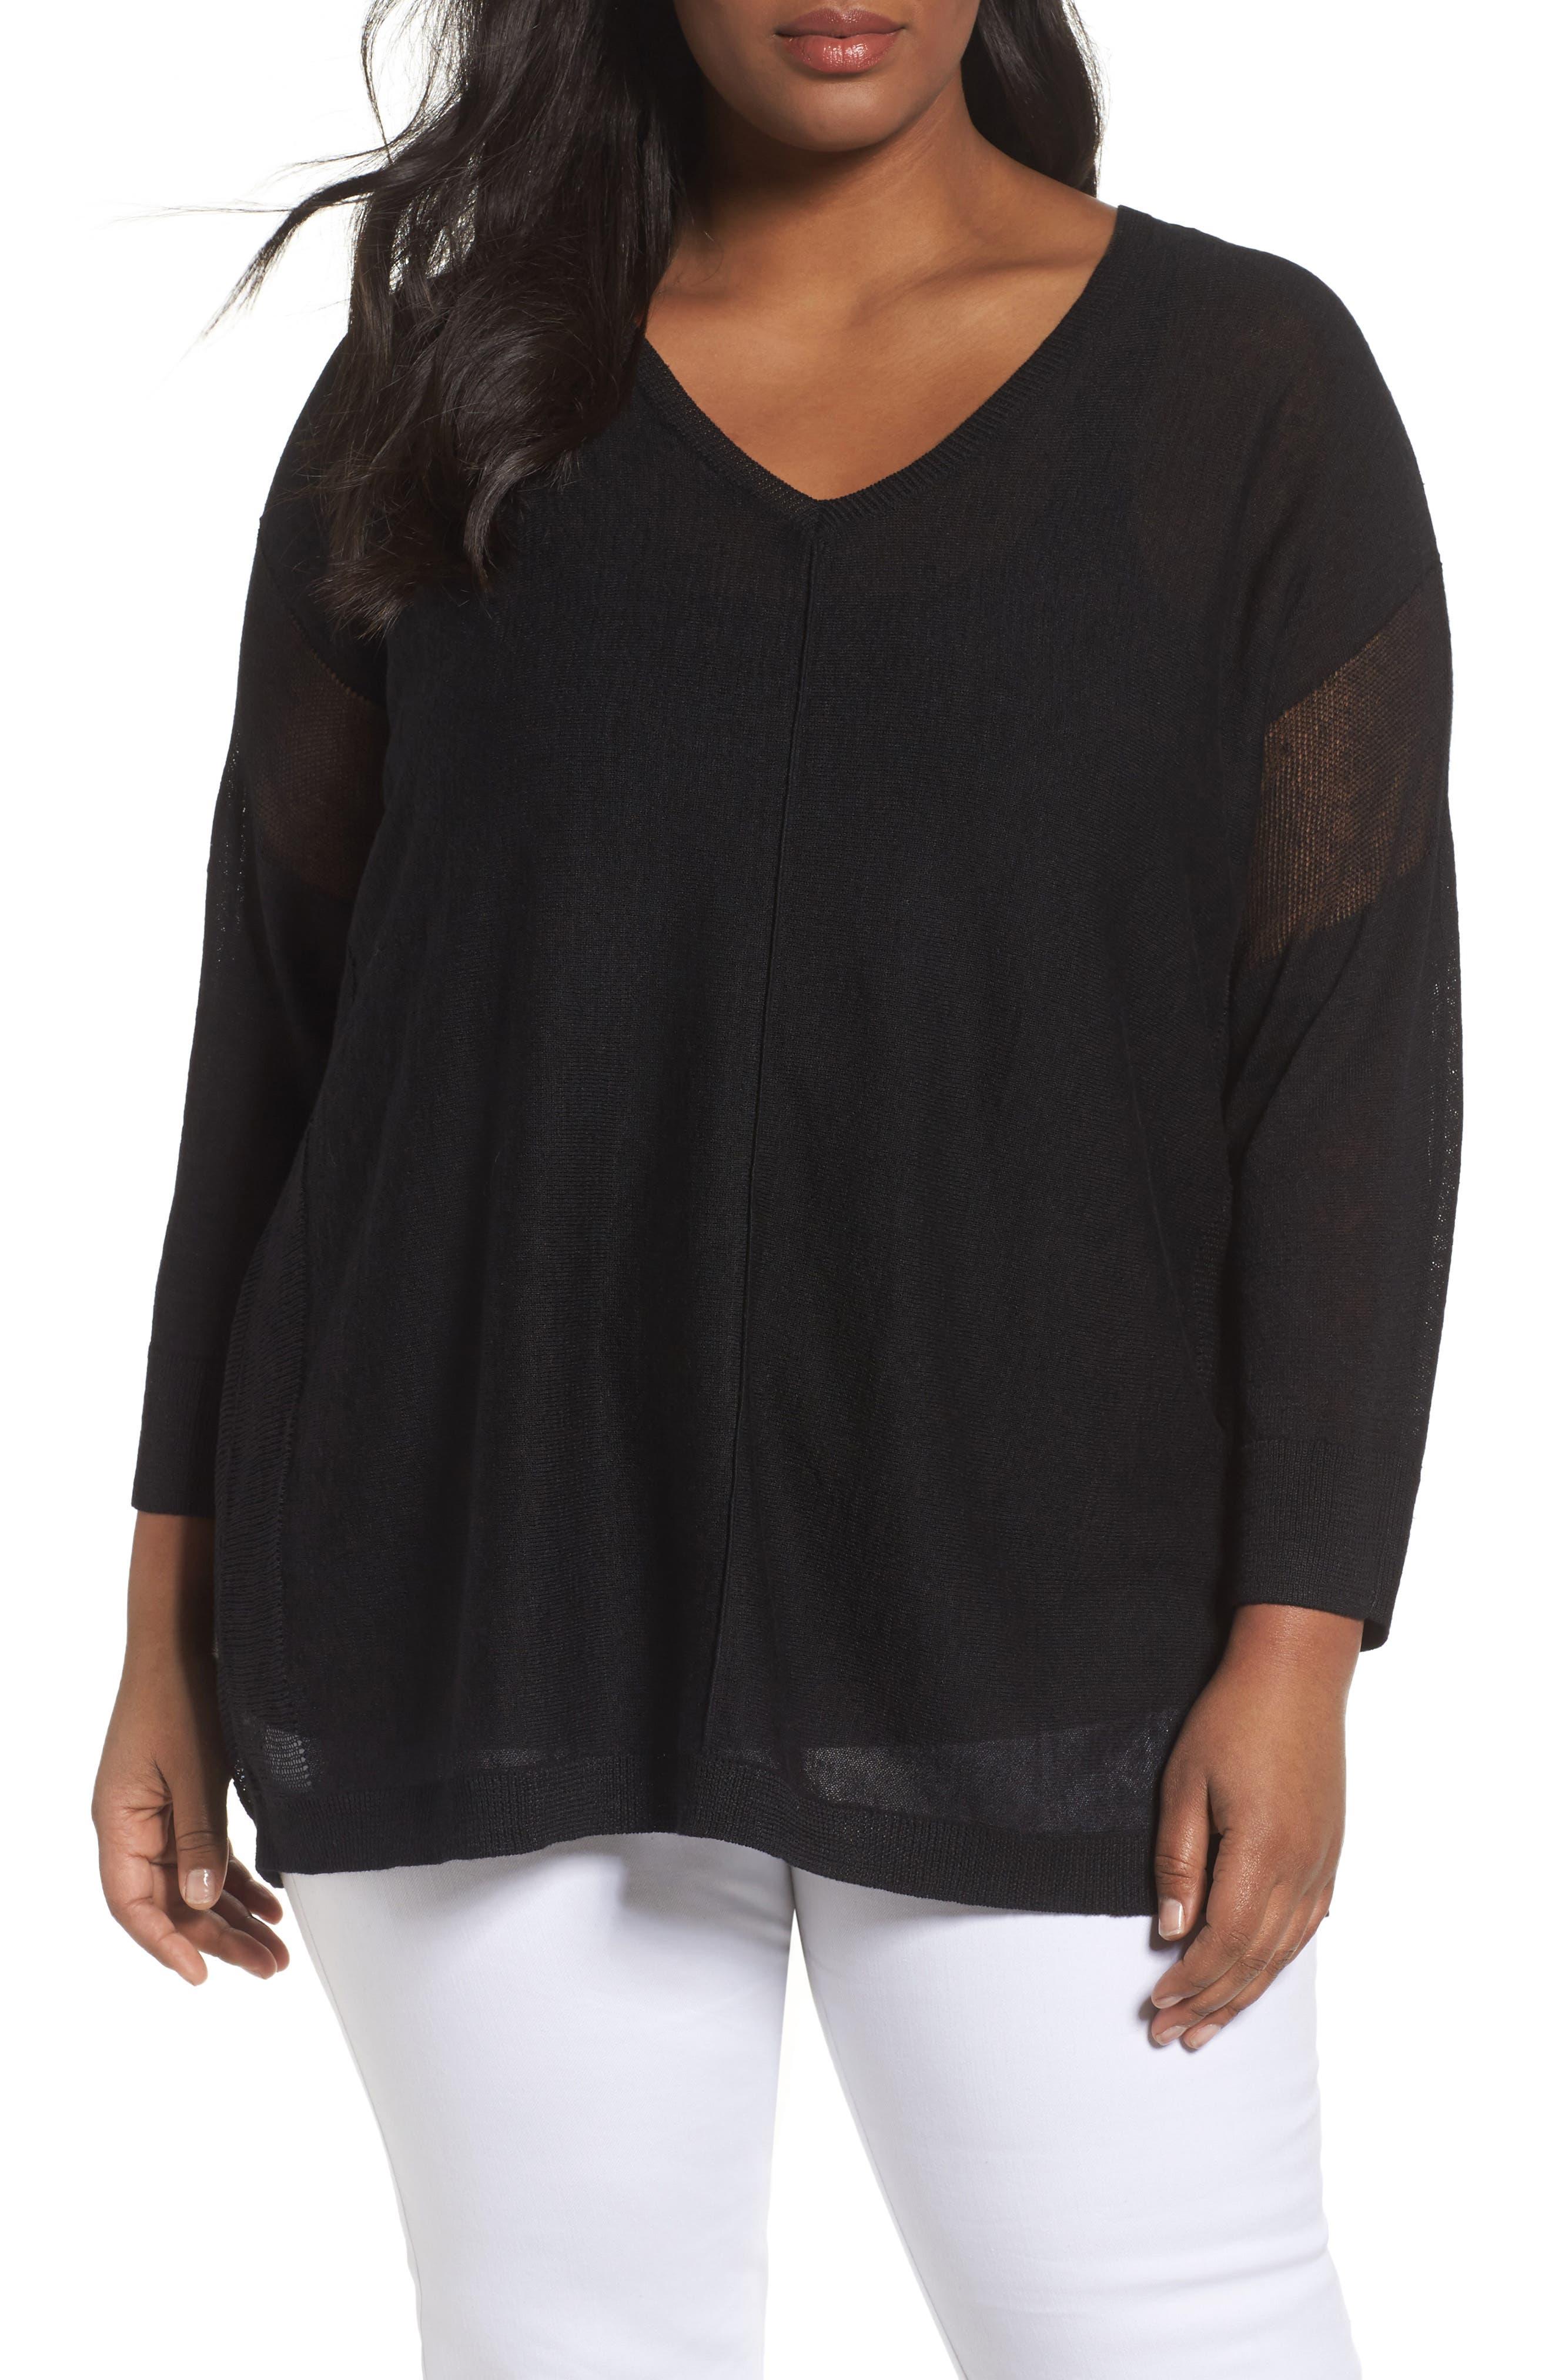 Main Image - Sejour Sheer Inset Linen Blend Tunic Top (Plus Size)